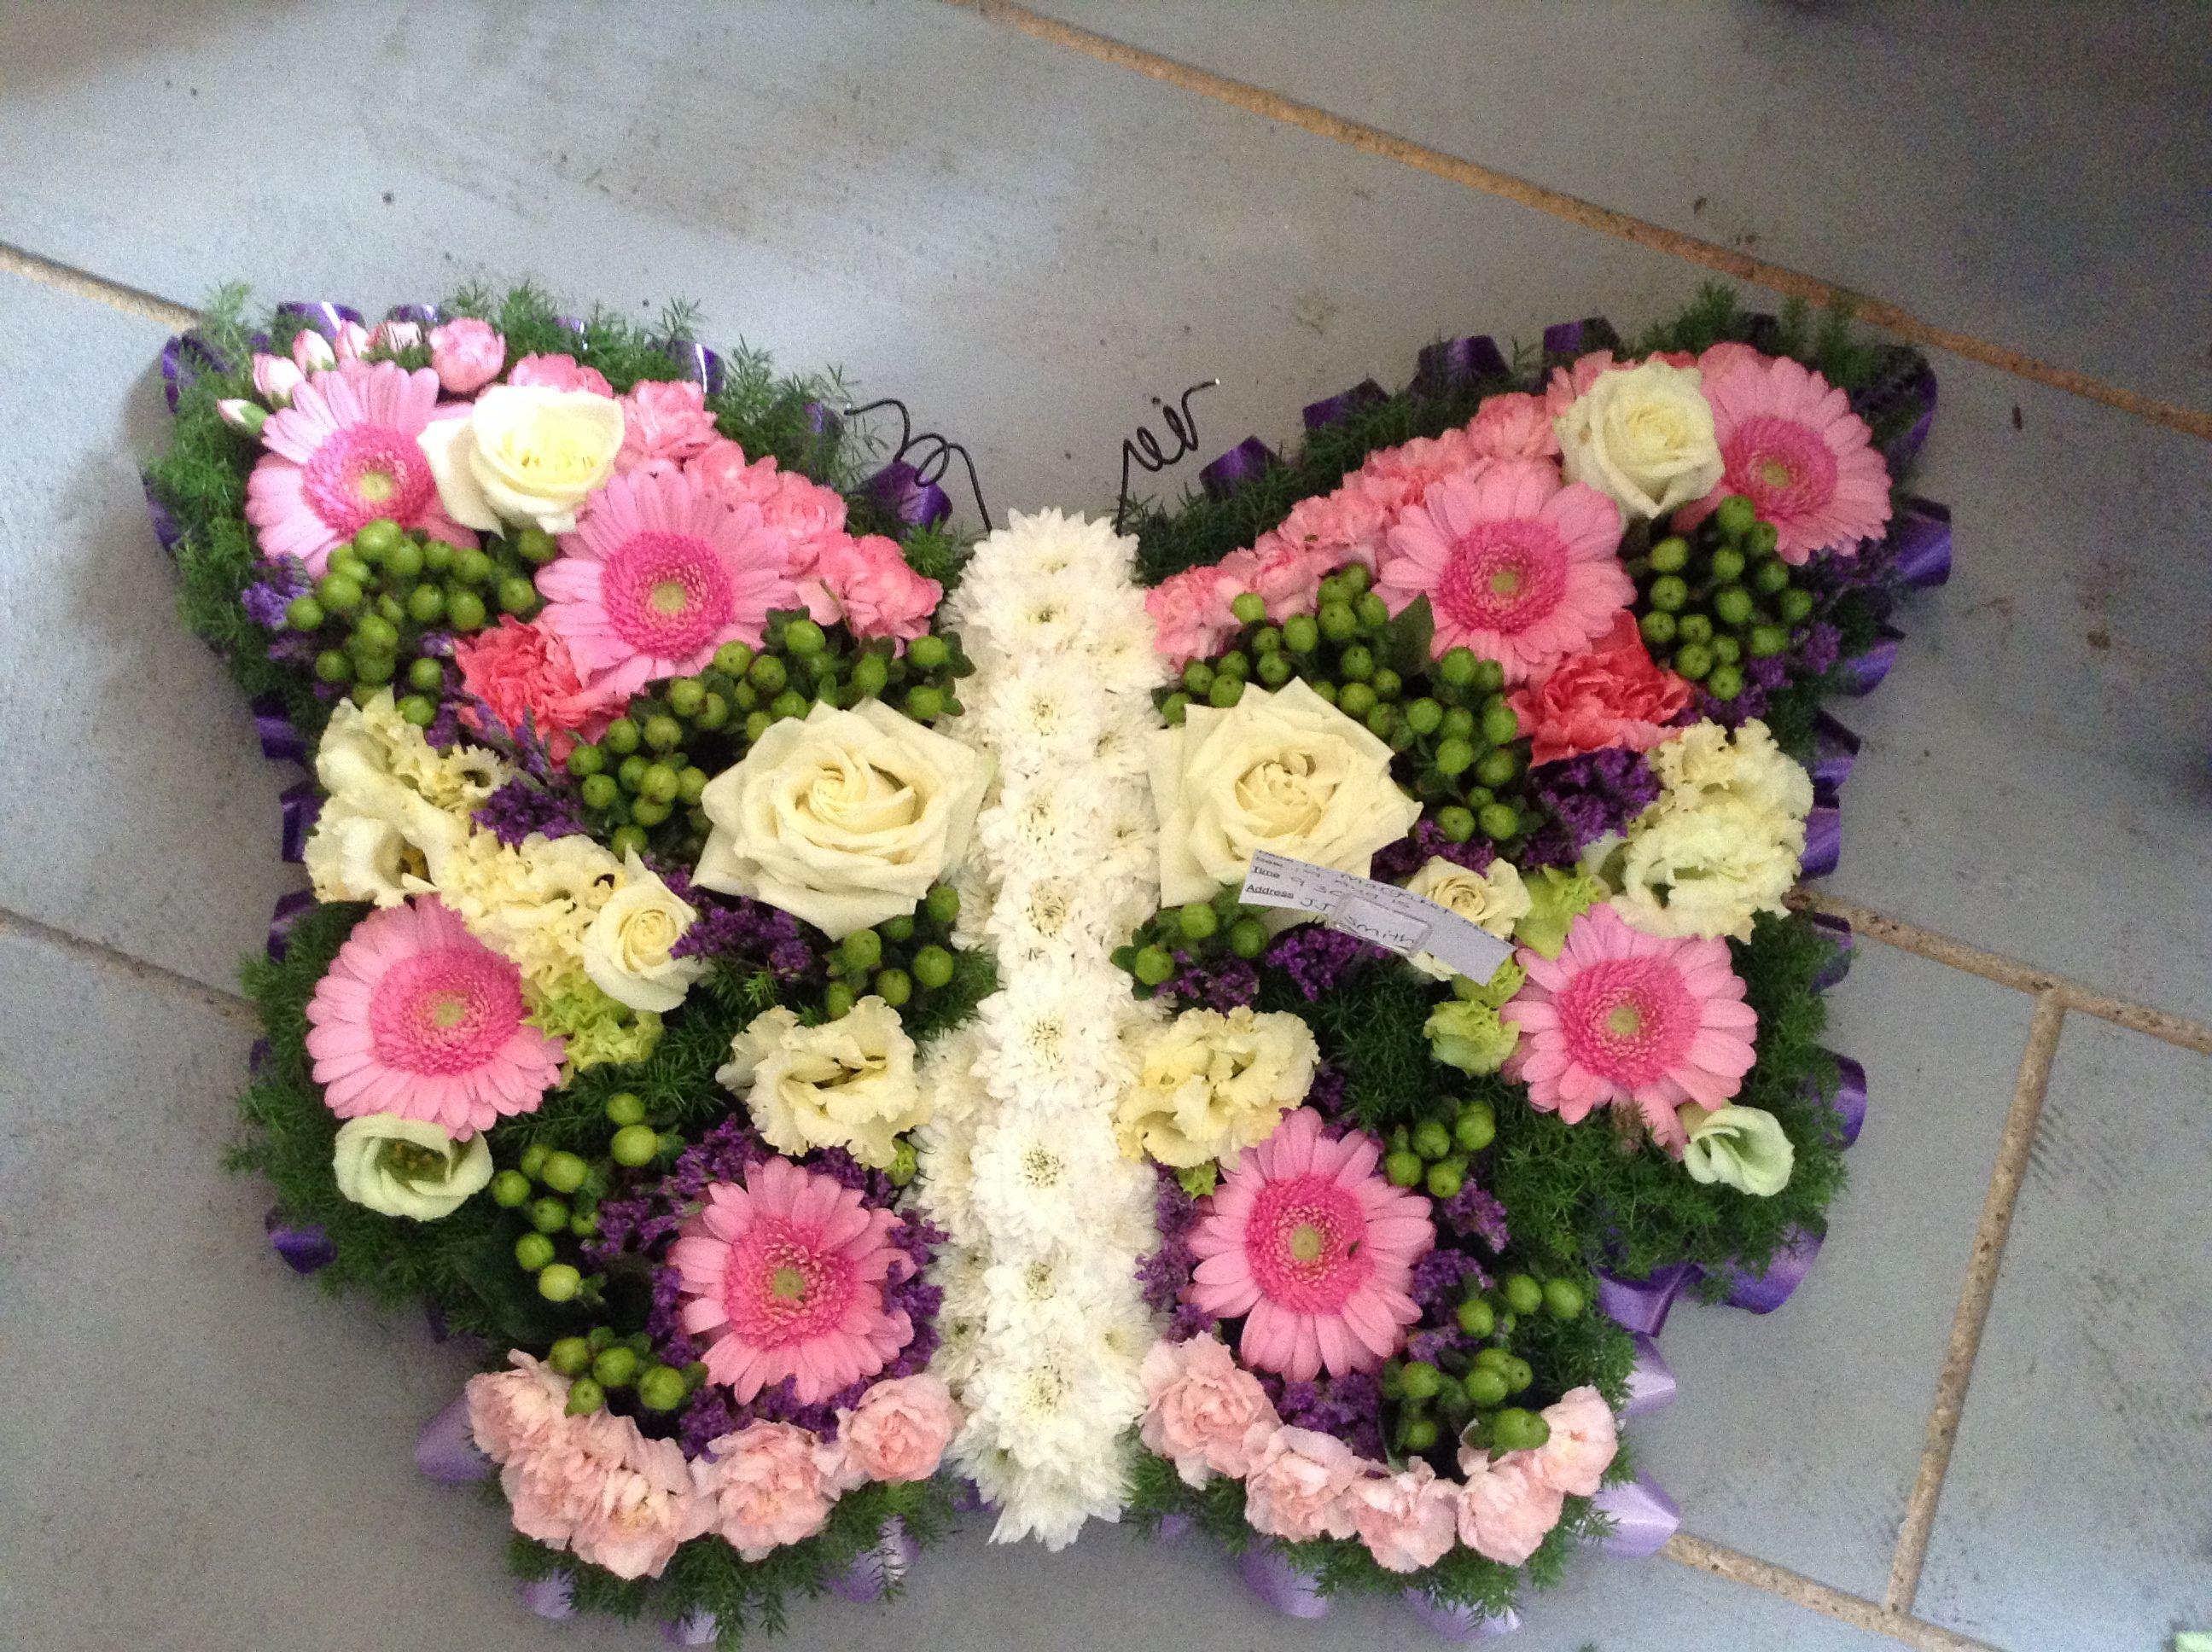 Pink butterfly funeral flower tribute bespoke funeral flowers pink butterfly funeral flower tribute bespoke funeral flowers unusual funeral flowers thefloralartstudio izmirmasajfo